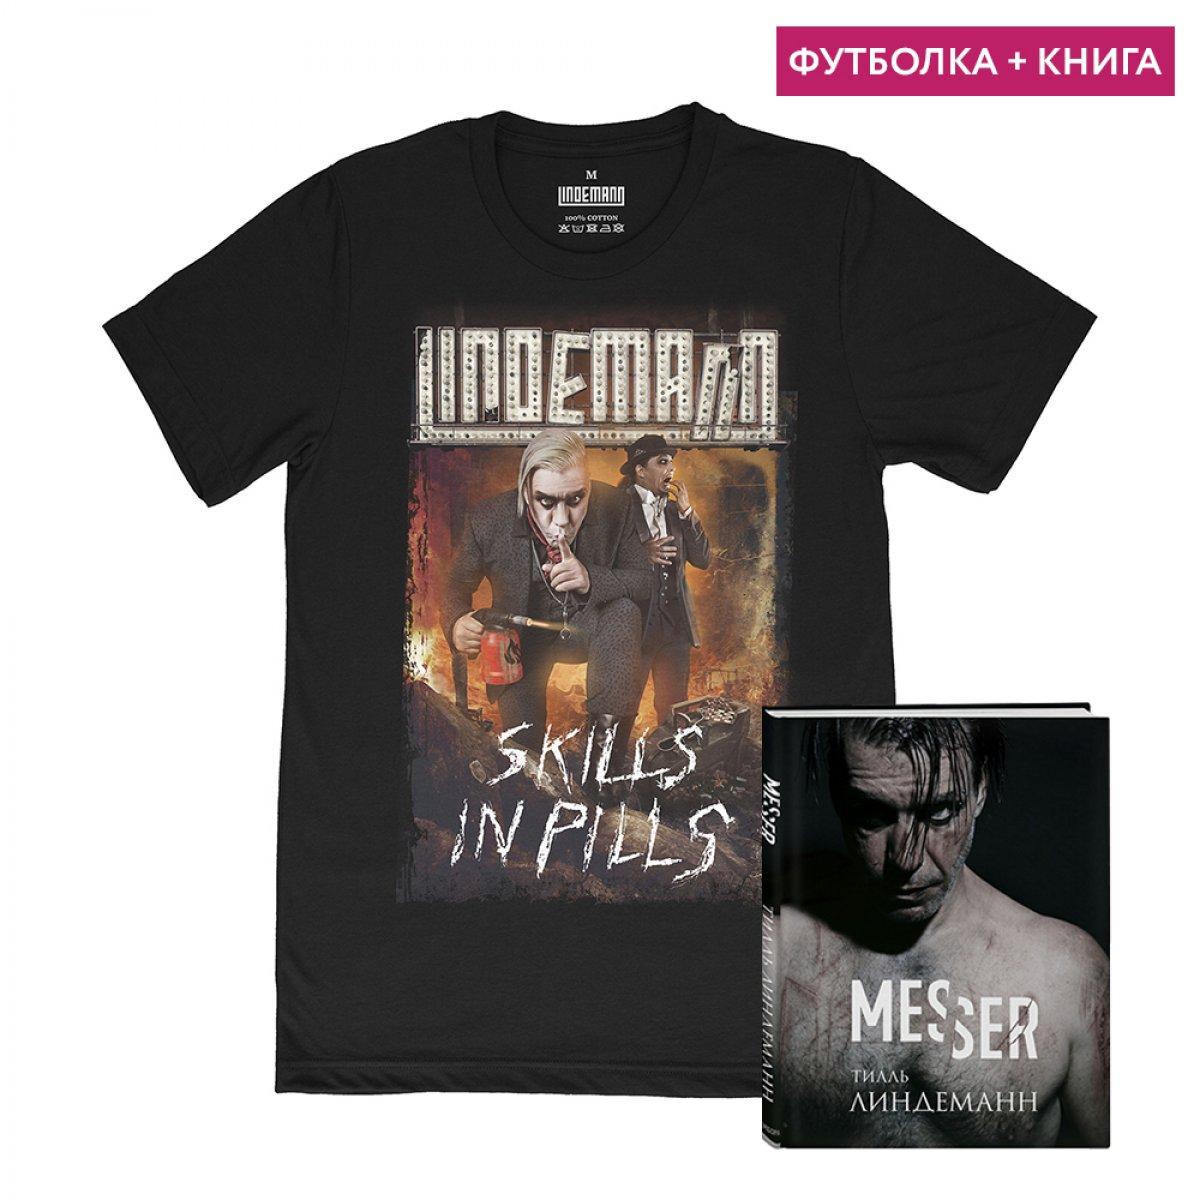 Комплект Книга «Тилль Линдеманн. Messer» + футболка «Lindemann Skills in Pills»